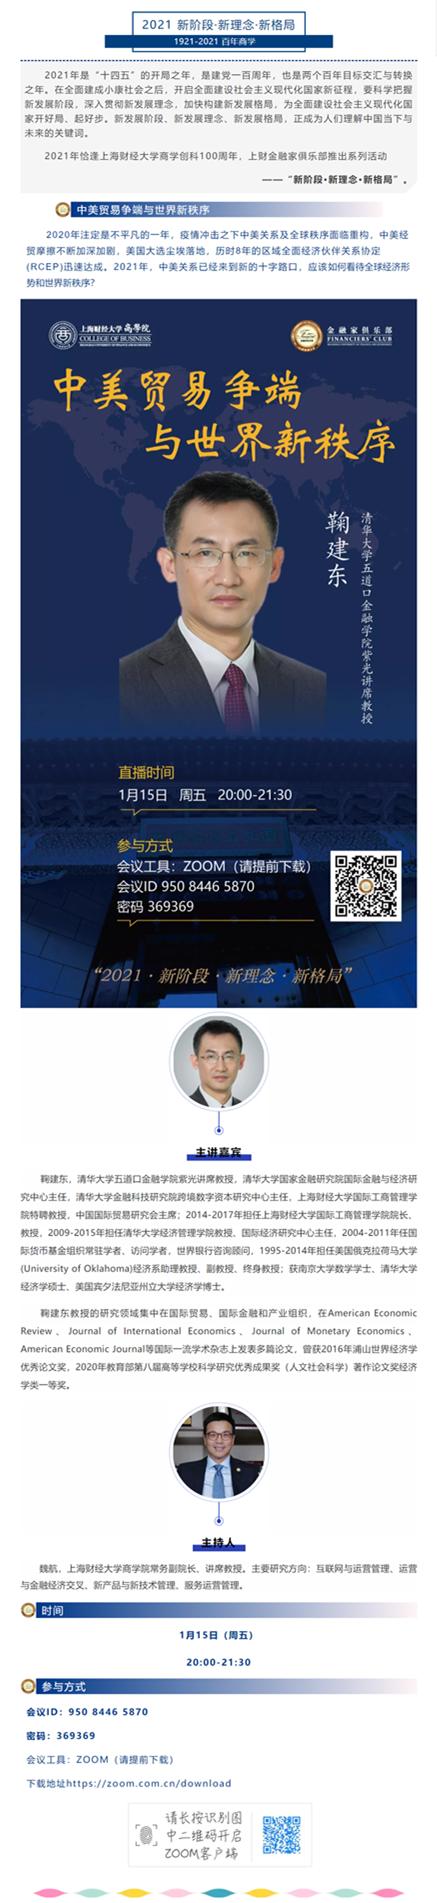 FireShot Capture 034 - 直播·1_15 - 鞠建东:中美贸易争端与世界新秩序 - mp.weixin.qq.com.png